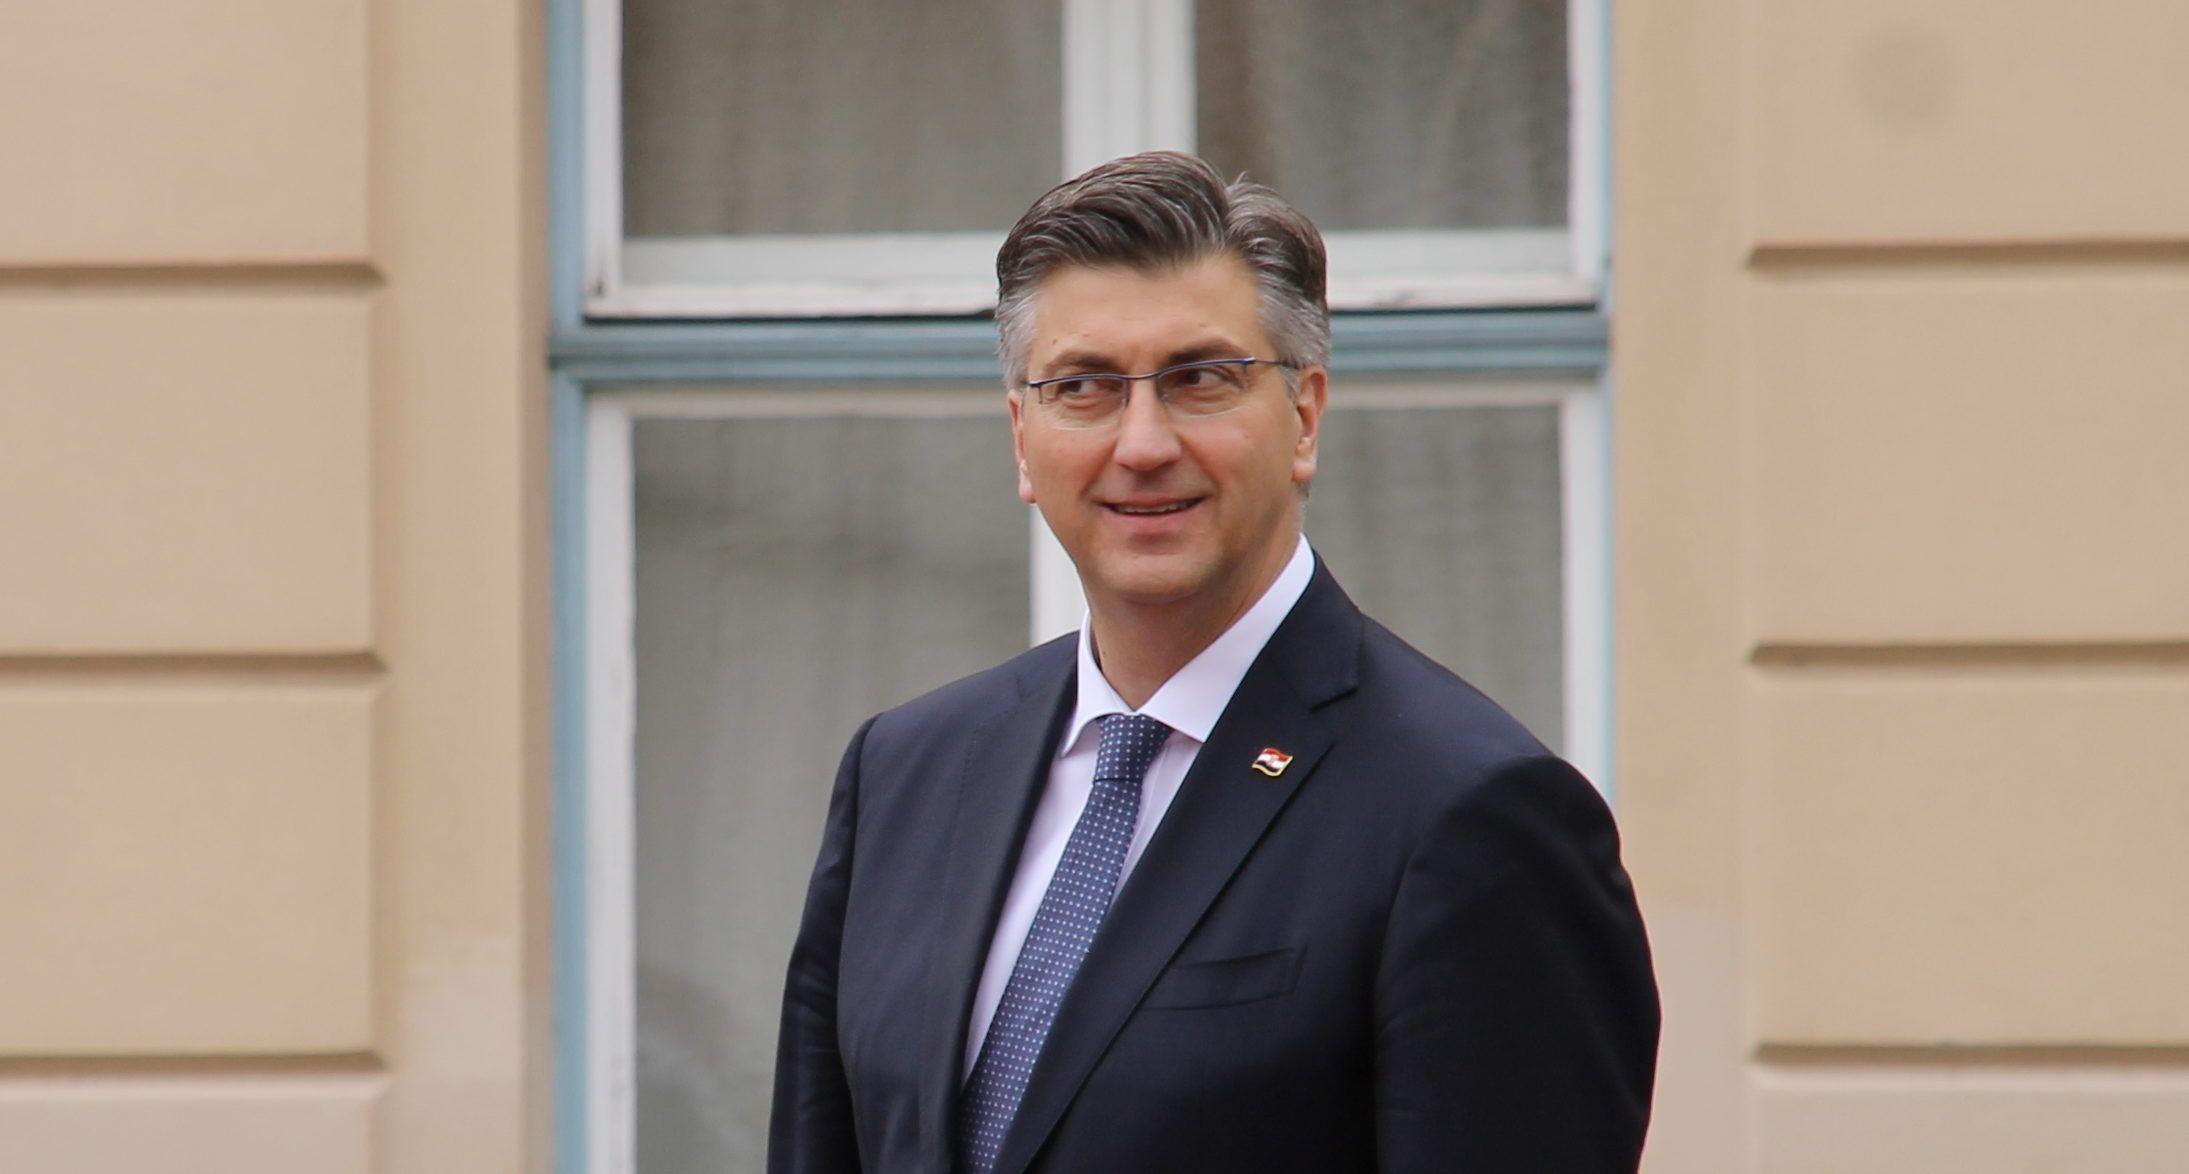 Plenković zadovoljan objavom kandidature Kolinde Grabar-Kitarović